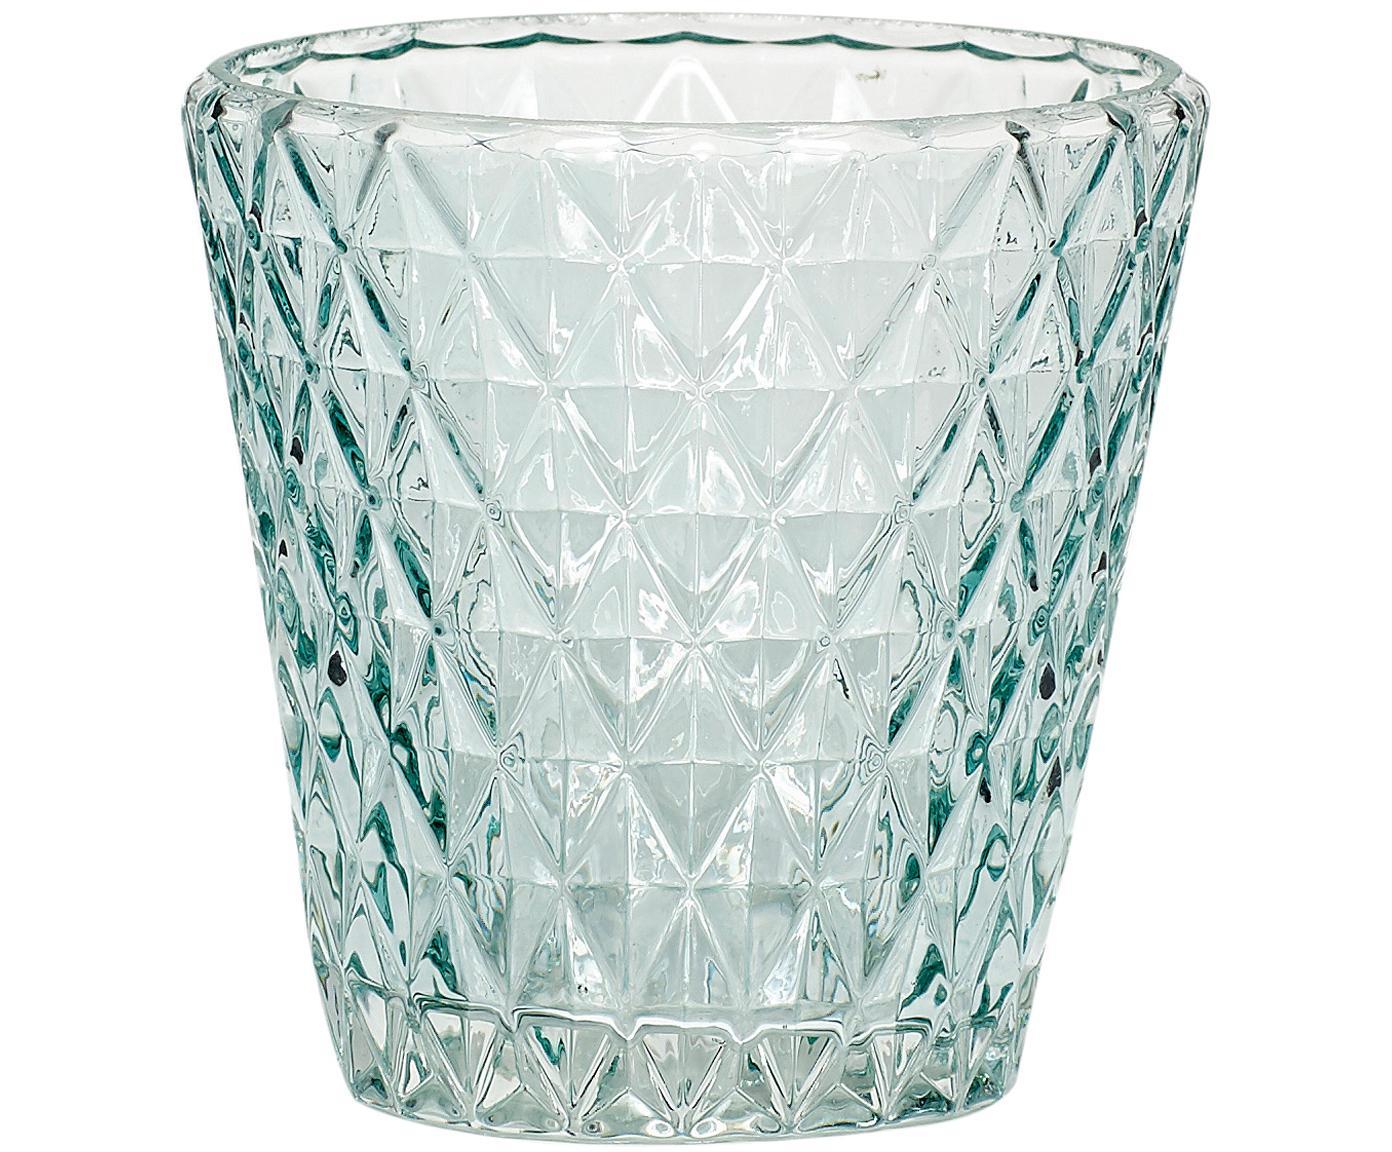 Teelichthalter Elsa, Glas, Hellblau, transparent, Ø 10 x H 10 cm